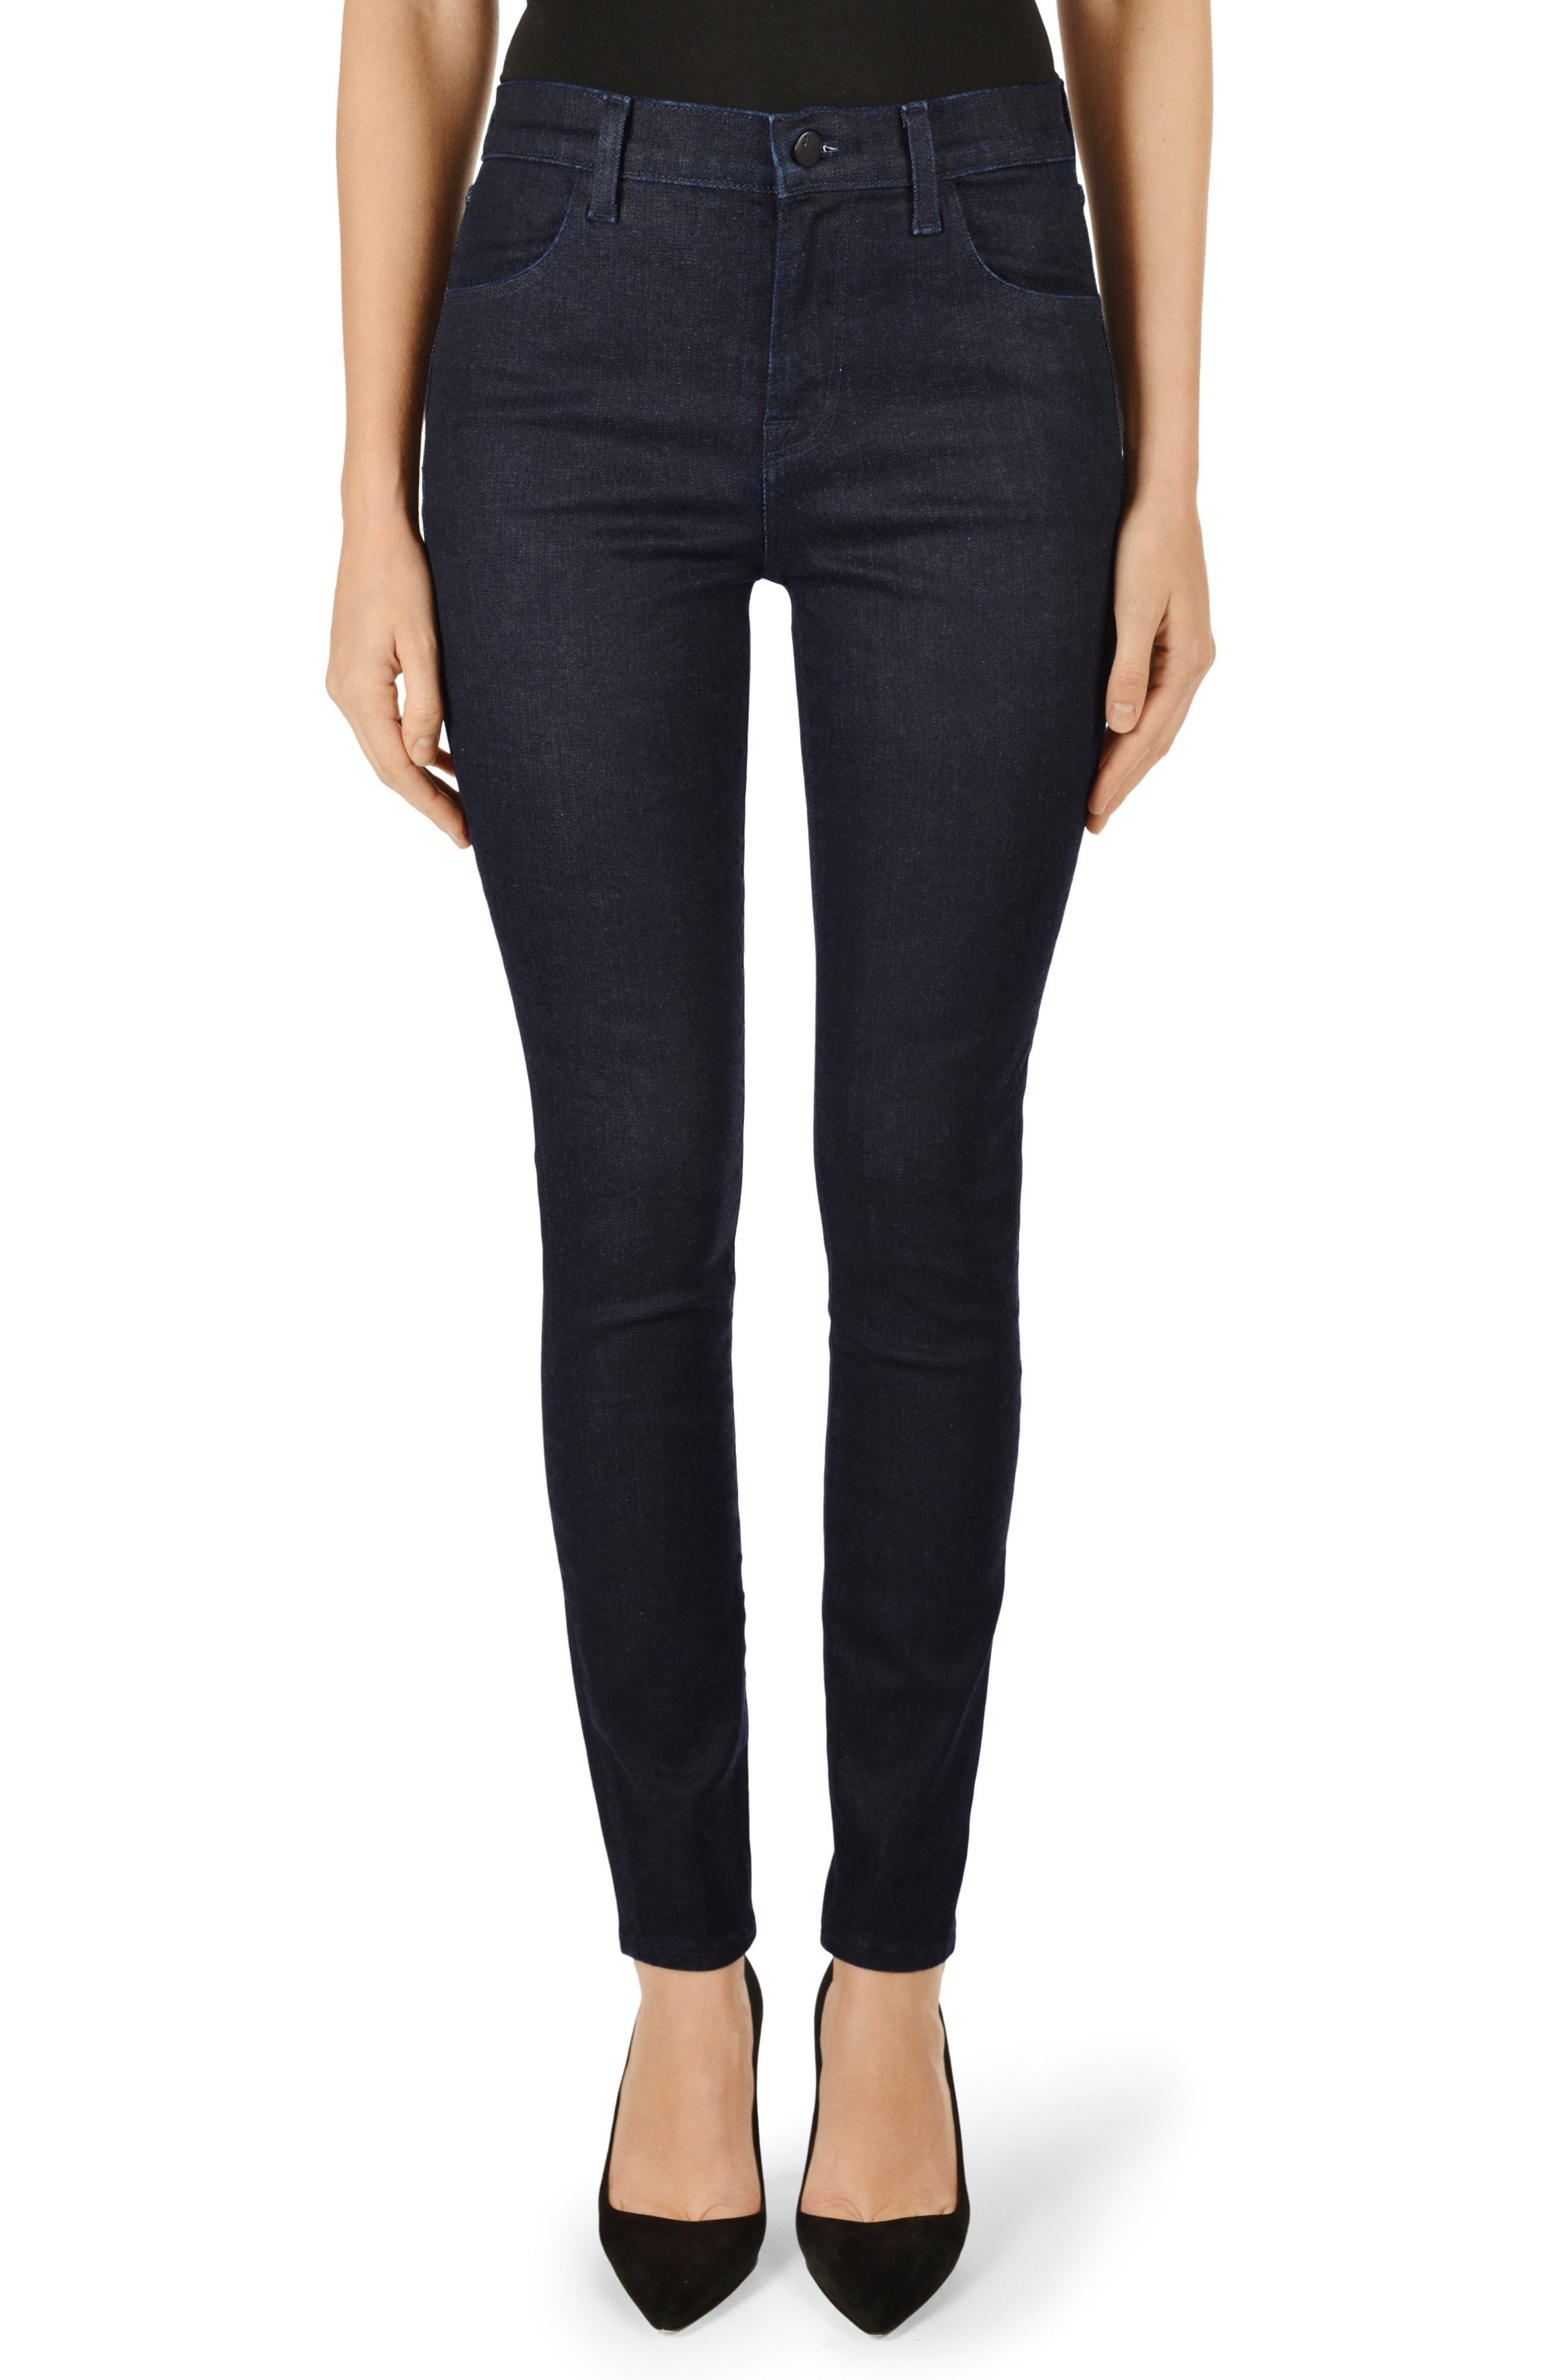 Maria High-Rise Skinny Jeans - Black Size 31